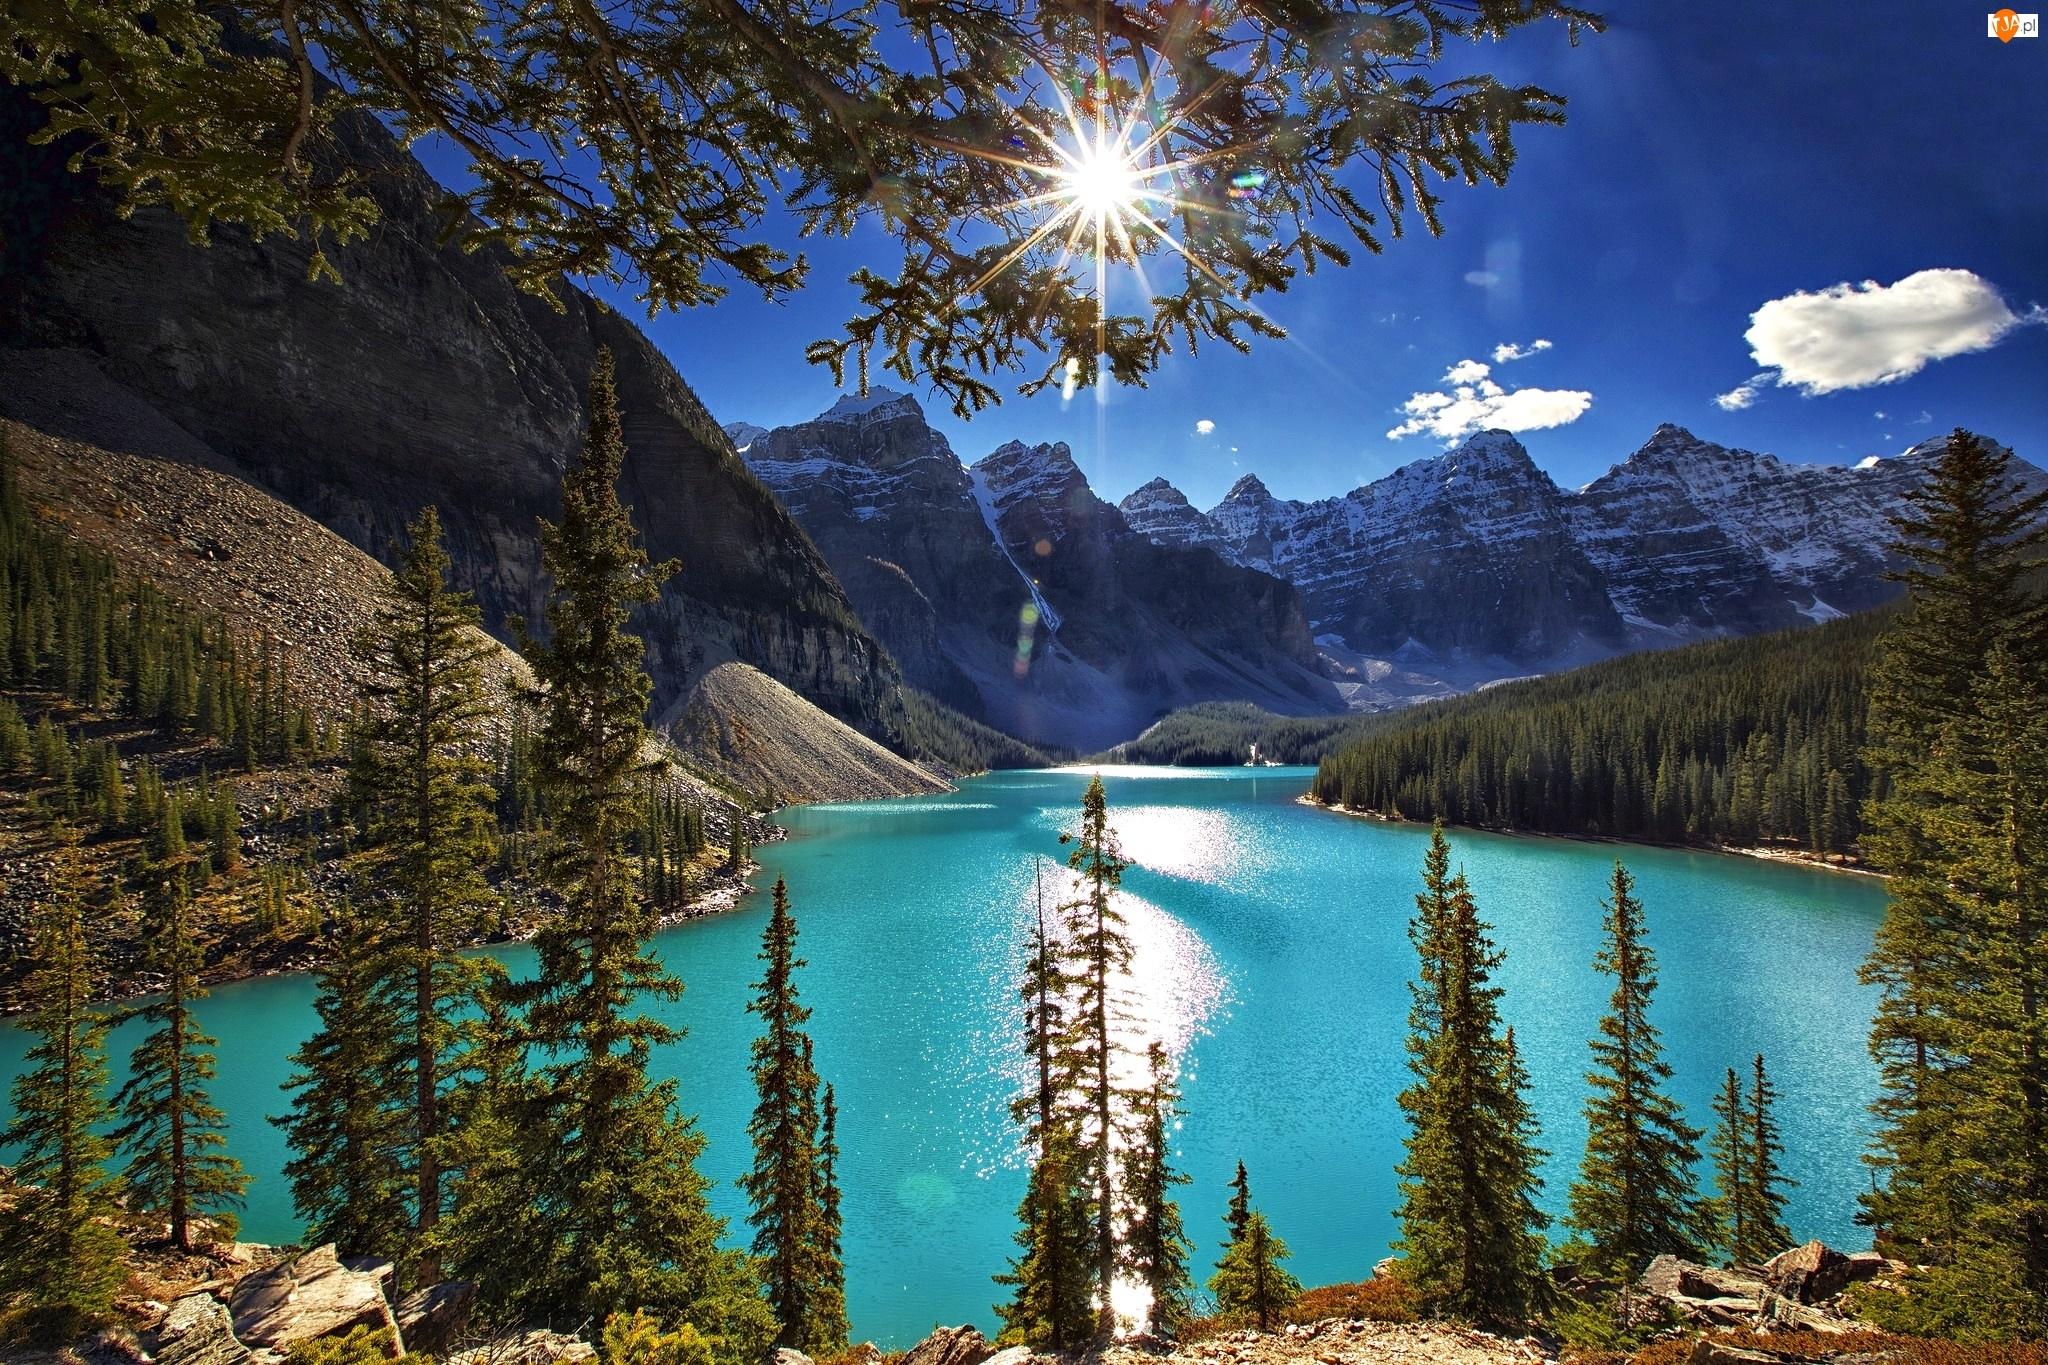 Jezioro Moraine, Góry, Alberta, Kanada